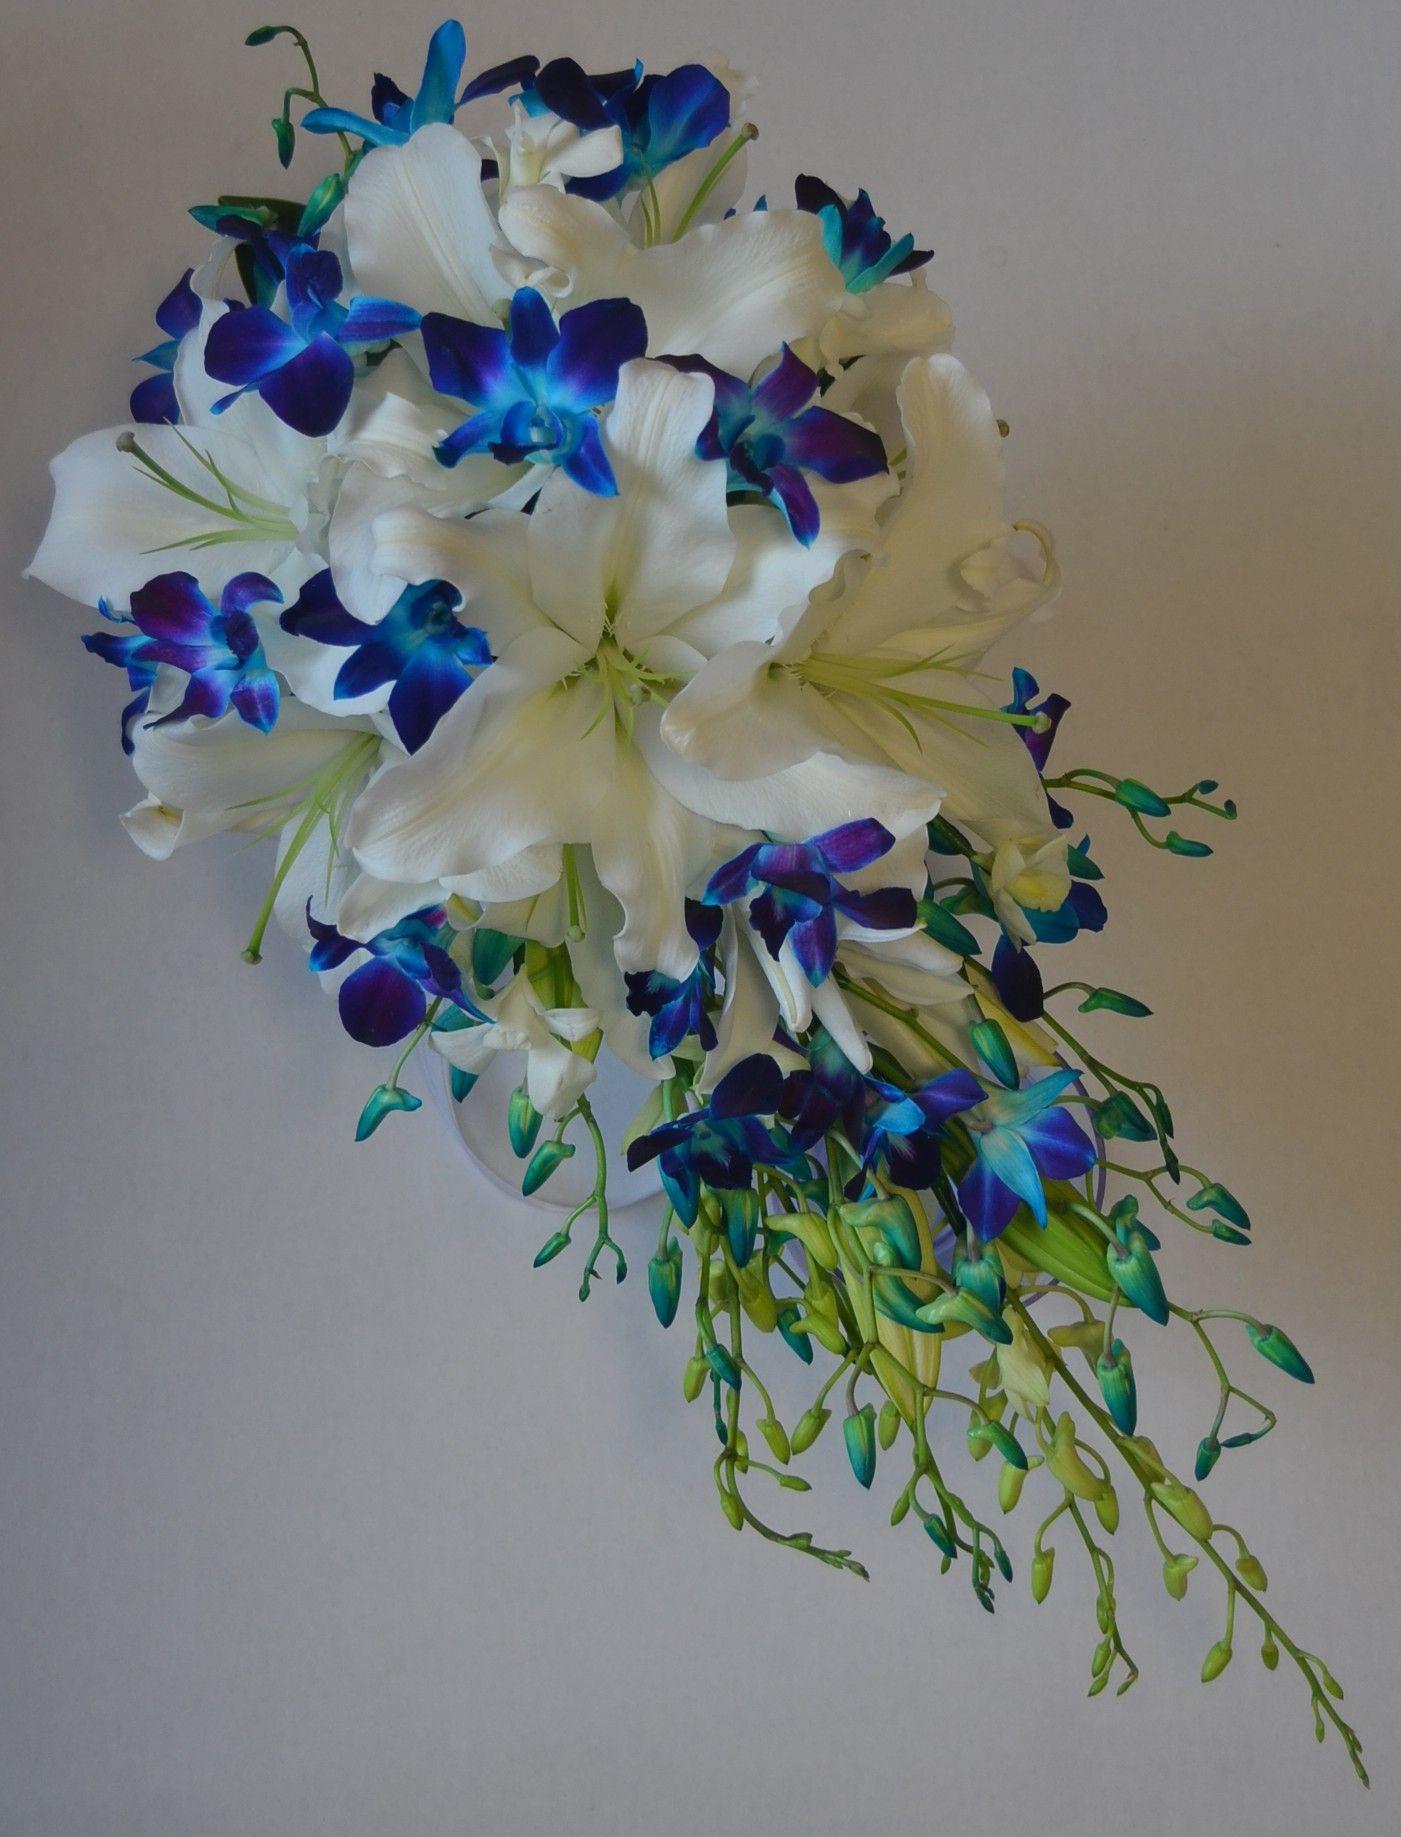 Blue Singapore Orchid White Lily Teardrop Bouquet Blue Orchid Wedding Bridesmaid Flowers Teardrop Bouquet